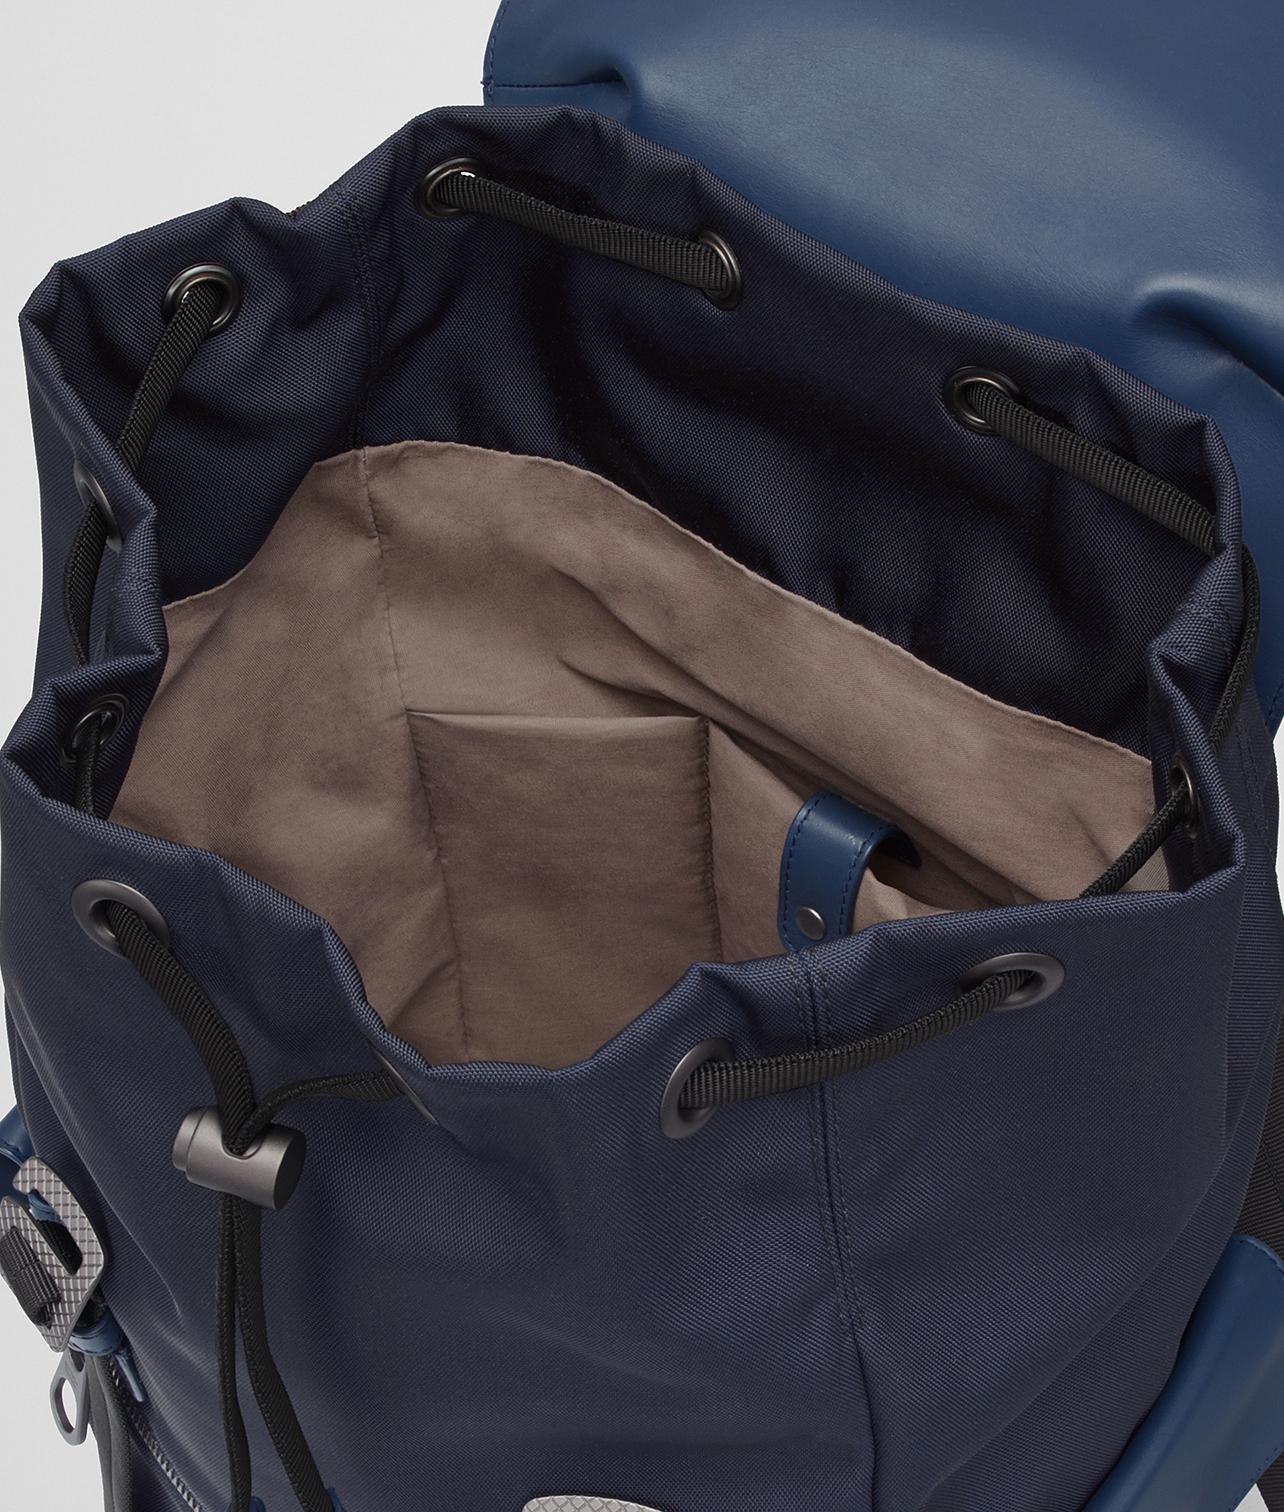 Bottega Veneta - Blue Tourmaline pacific Hi-tech Canvas Sassolungo Backpack  for Men -. View fullscreen 6c6ab53f8ae63